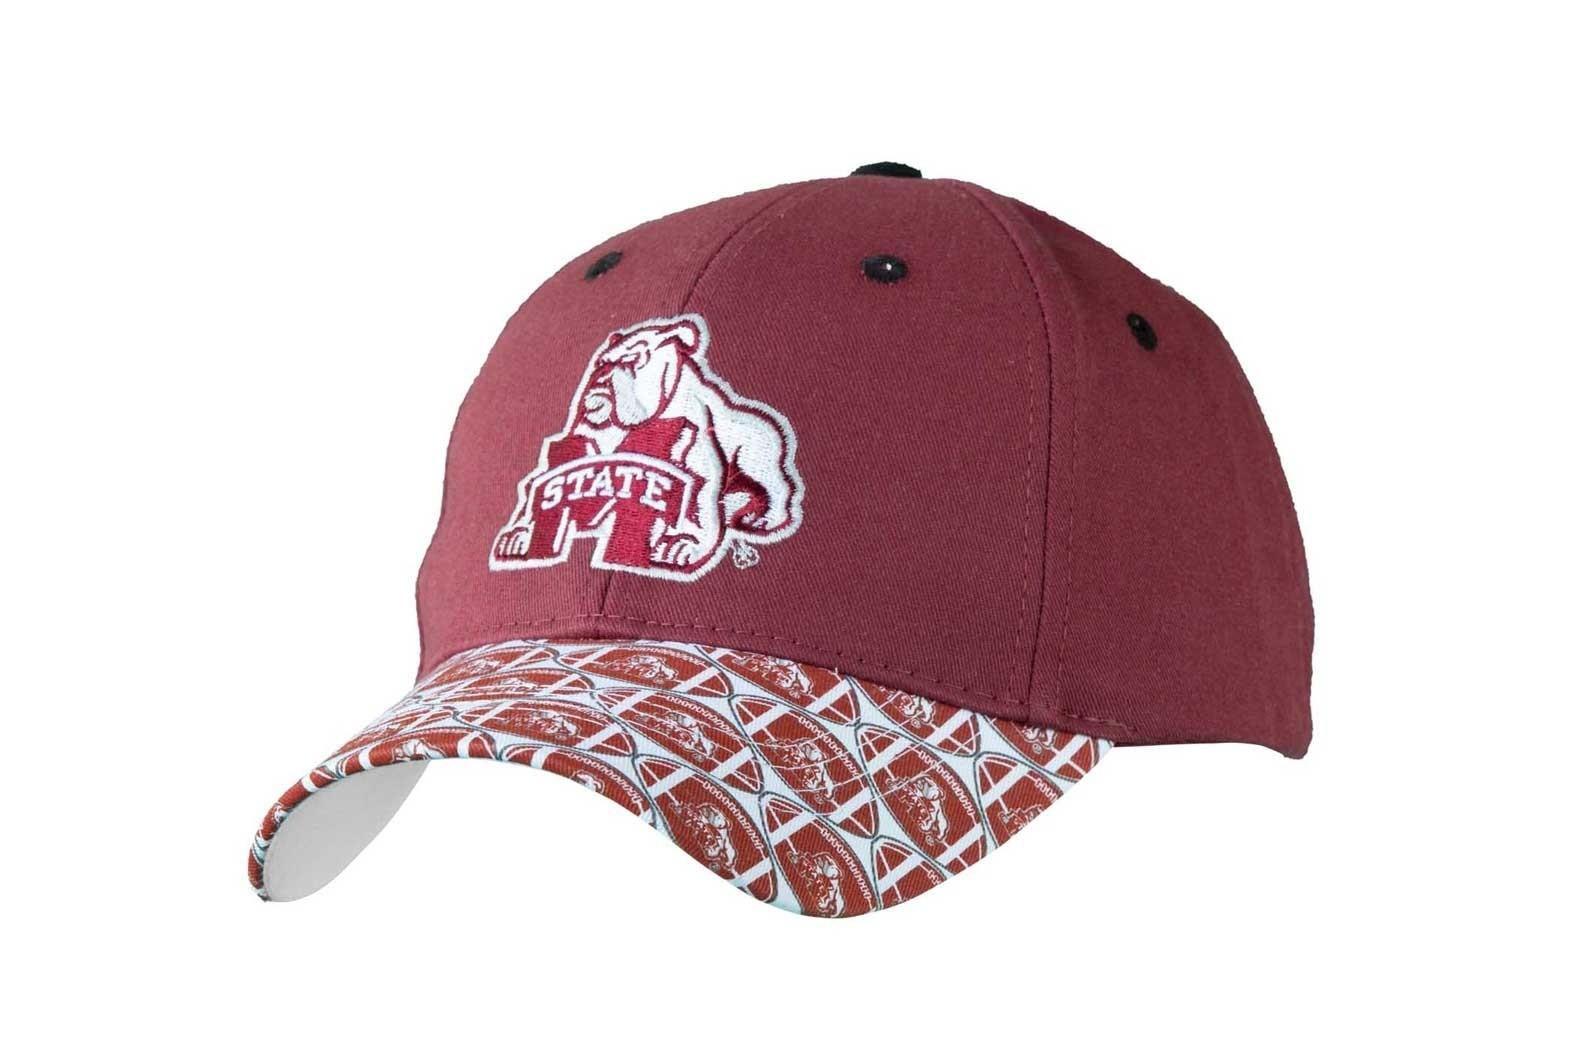 Mississippi State University Men's Adjustable Baseball Cap-Maroon